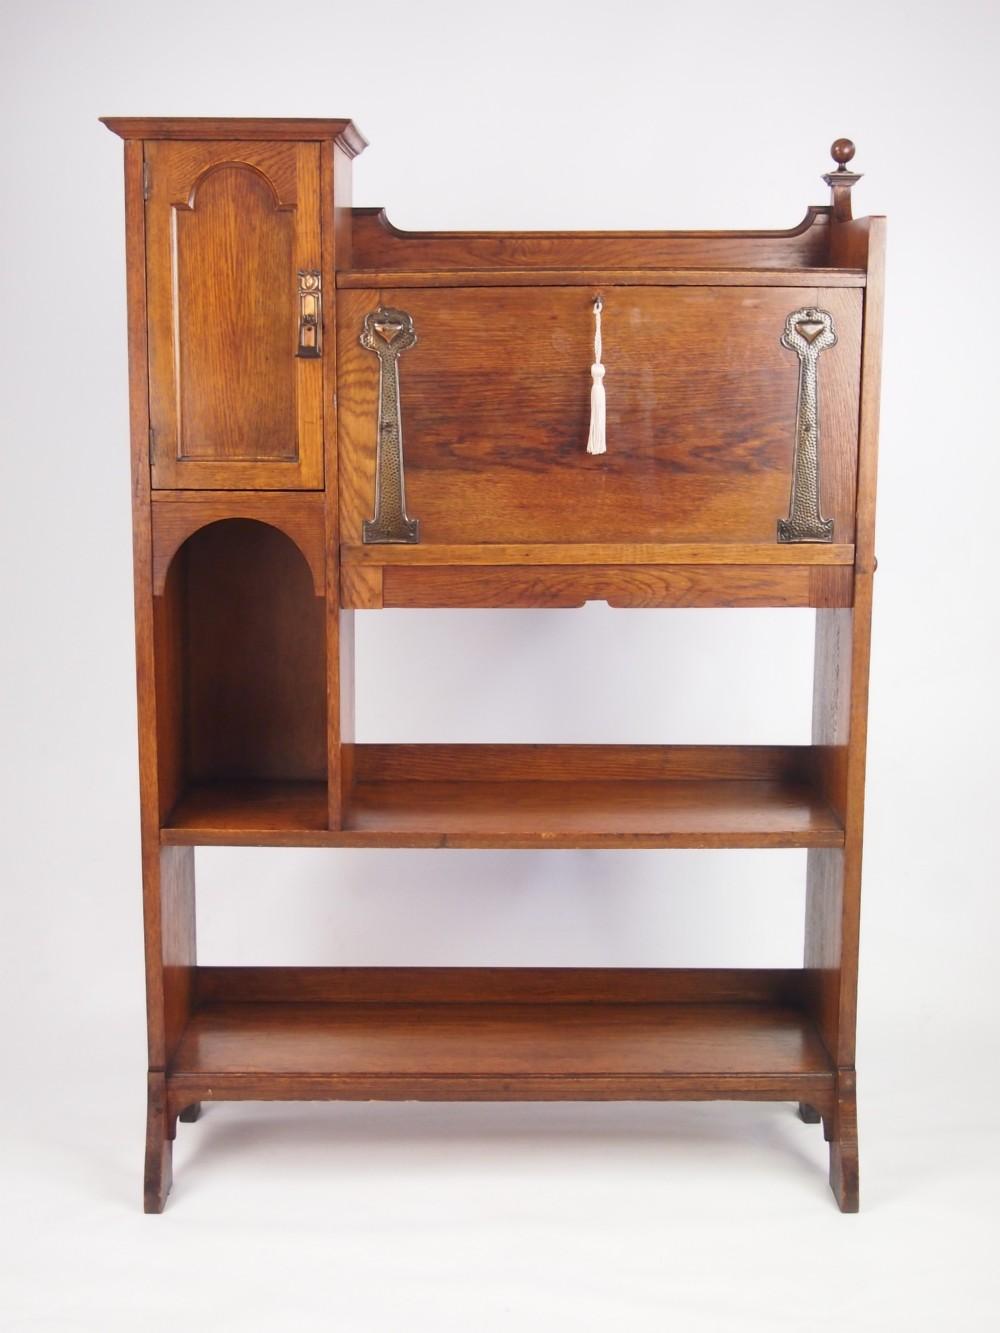 Arts and crafts bureau -  Arts And Crafts Oak Hall Bureau Bookcase Download